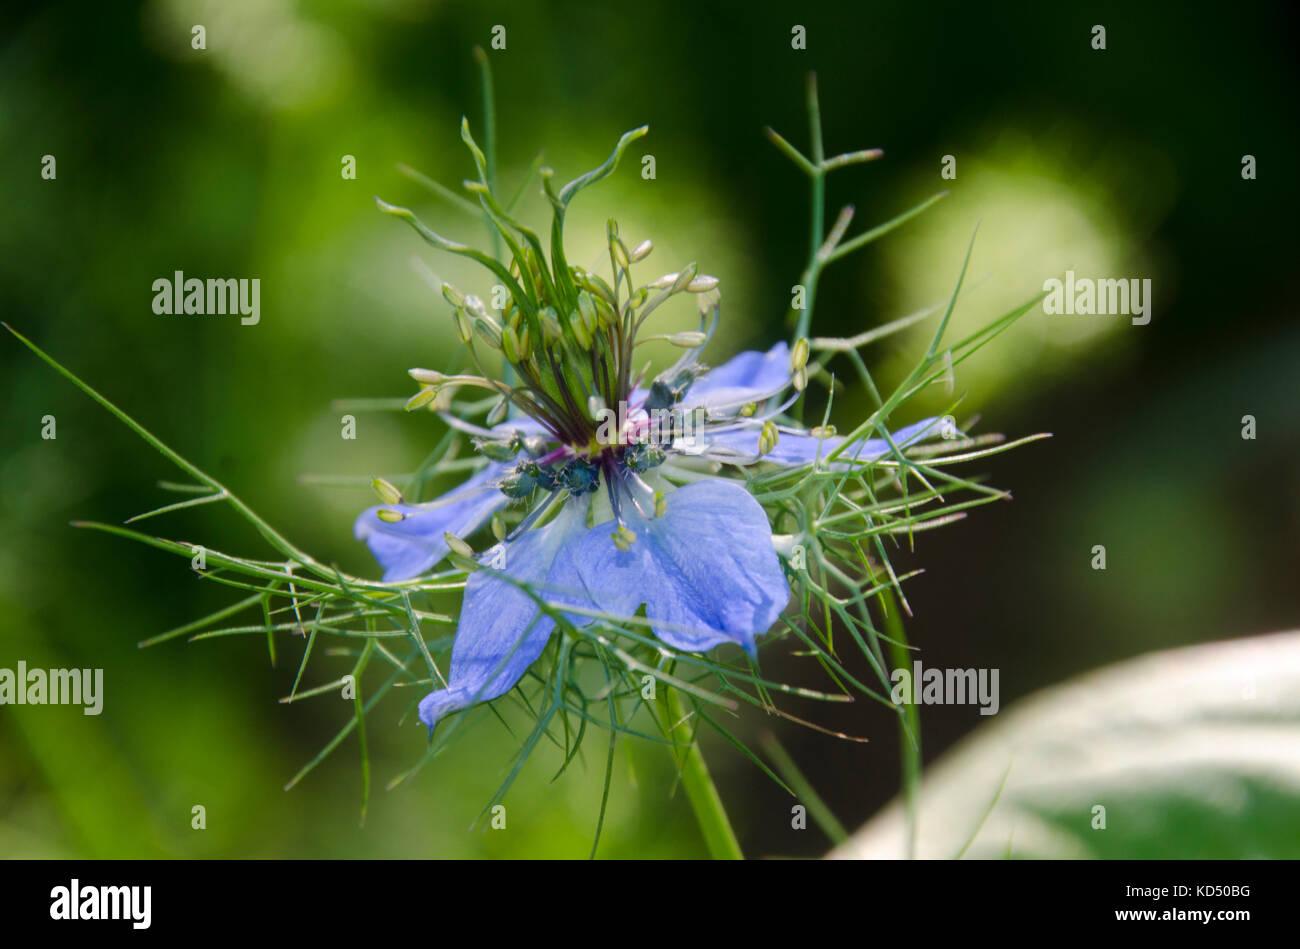 Blue flower, Nigella, or Persian Jewel, close up, Maine, USA - Stock Image